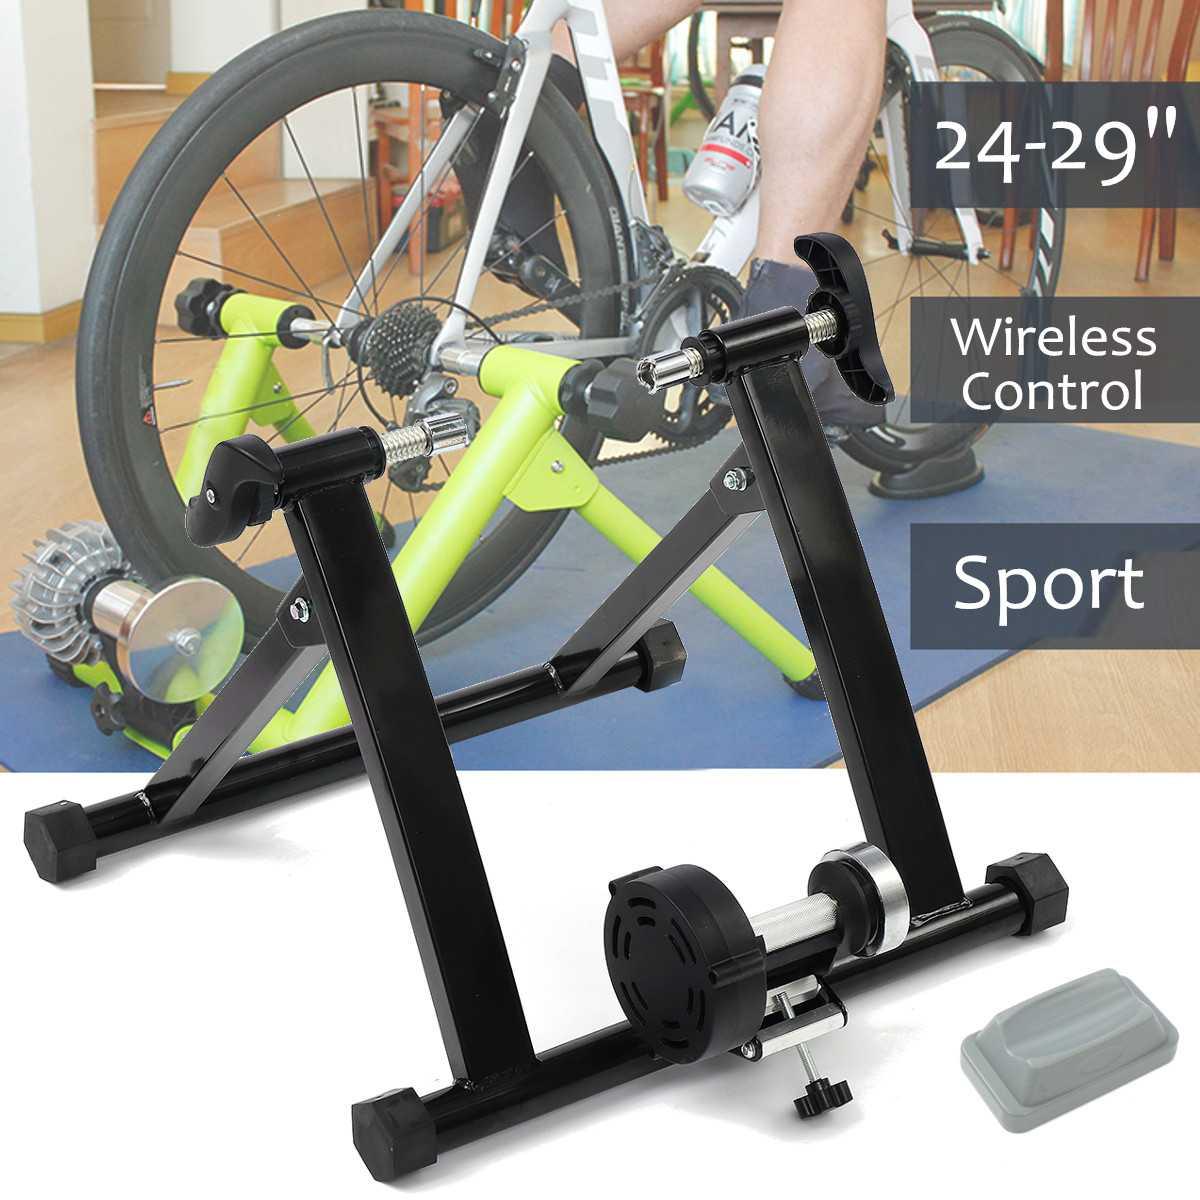 Indoor Bicycle Bike Trainer 4-29 Inch Wireless Black Indoor Bicycle Bike Trainer Exercise Fitness Stand